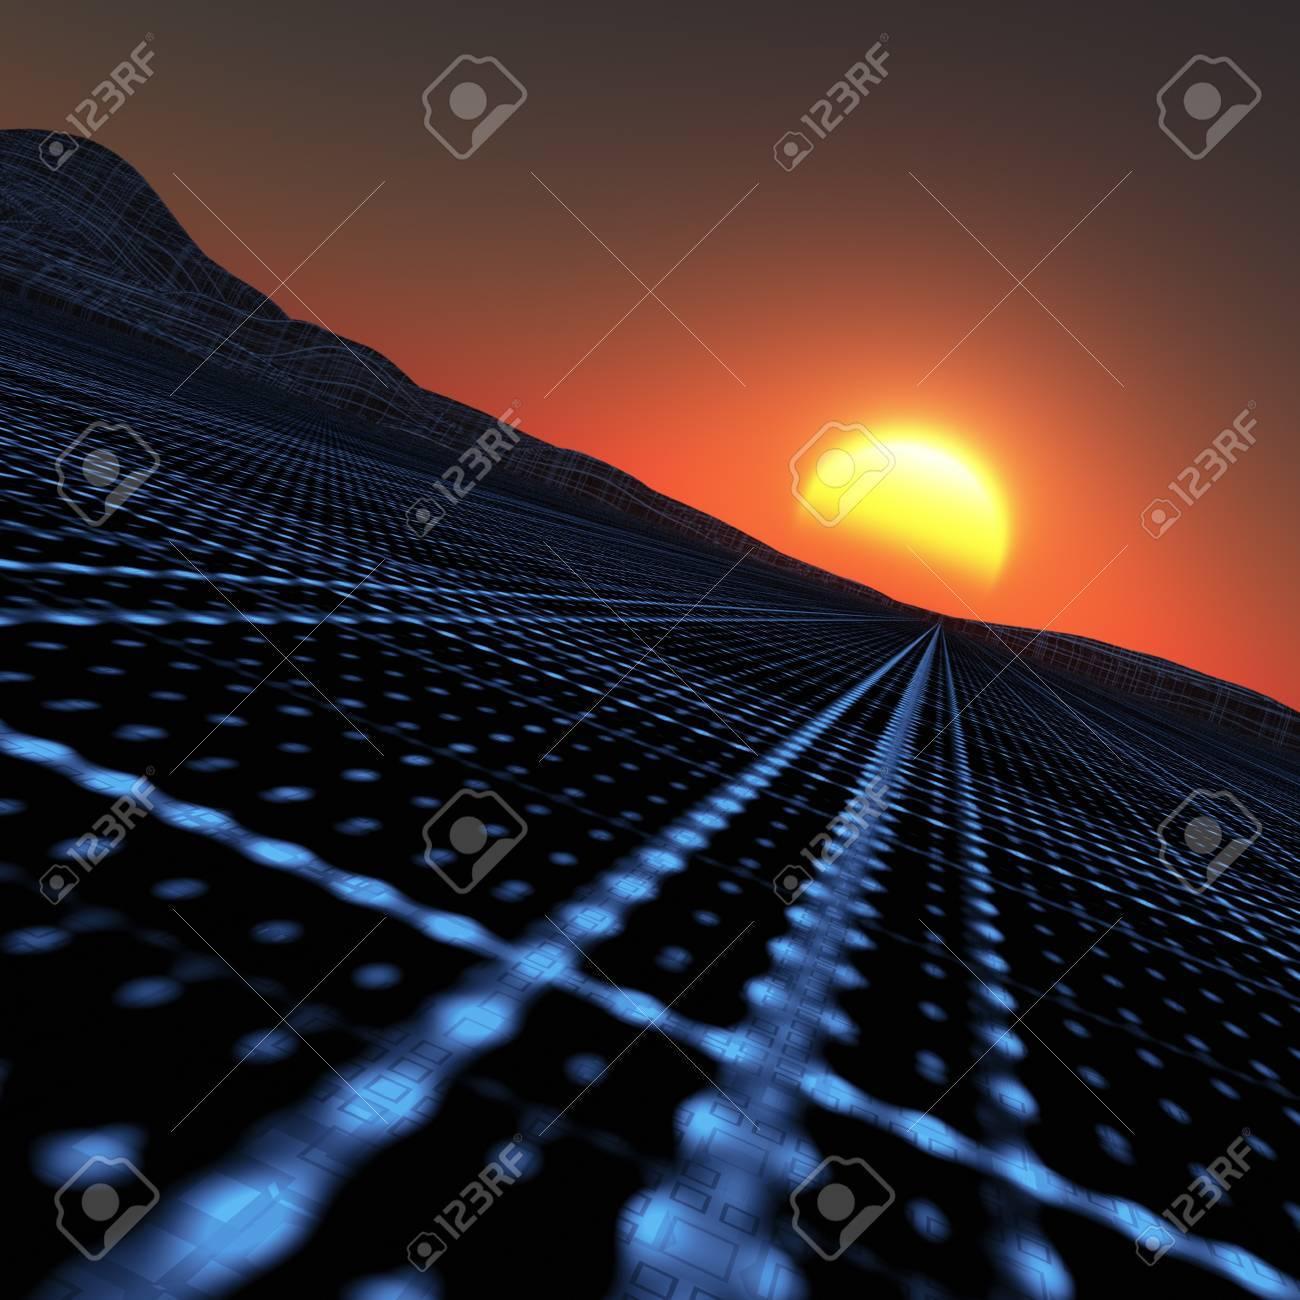 A blue grid vanishing point to horizon sunset. Stock Photo - 7517407